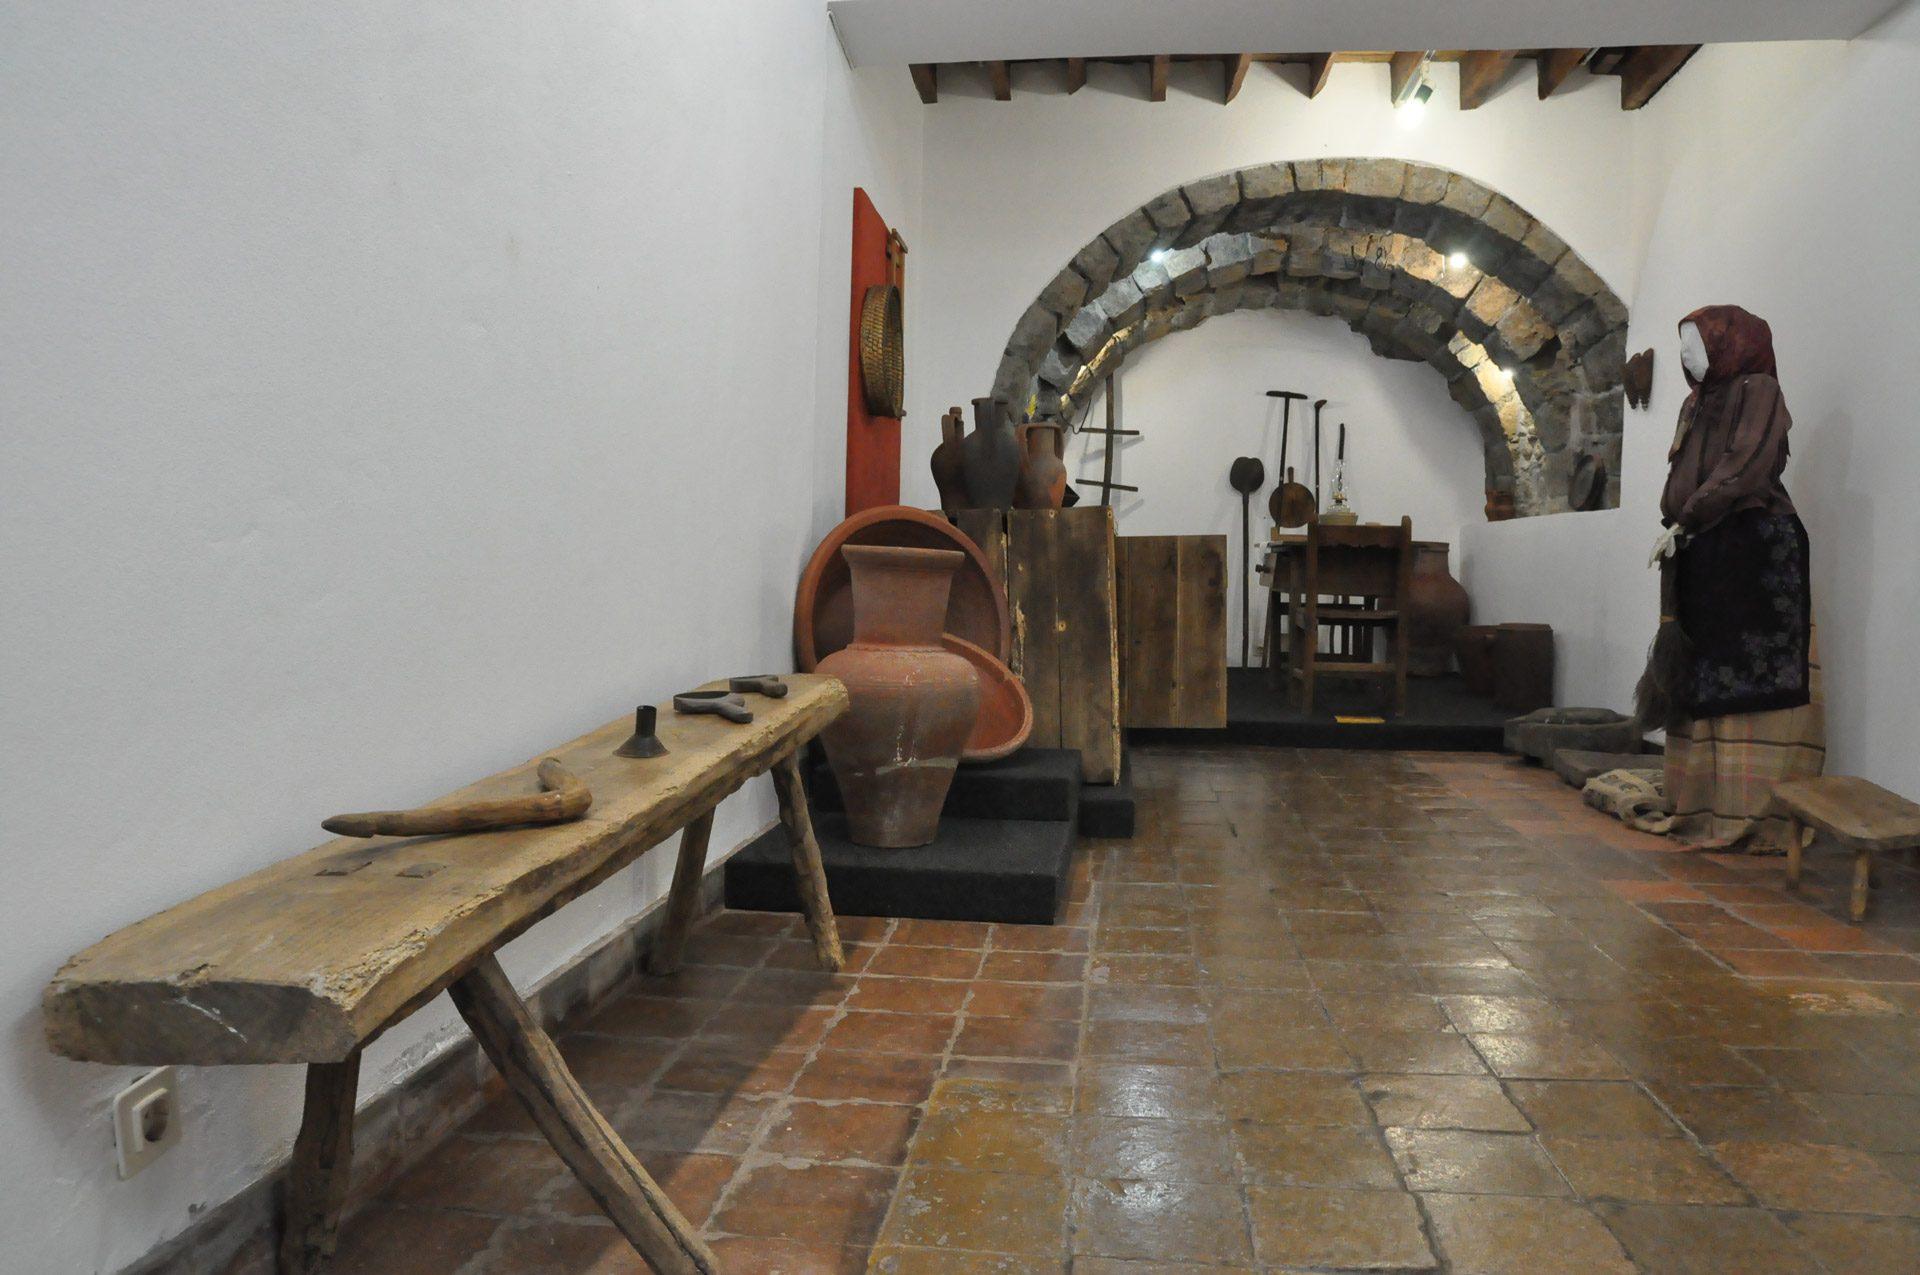 Cozinha tradicional e vida doméstica